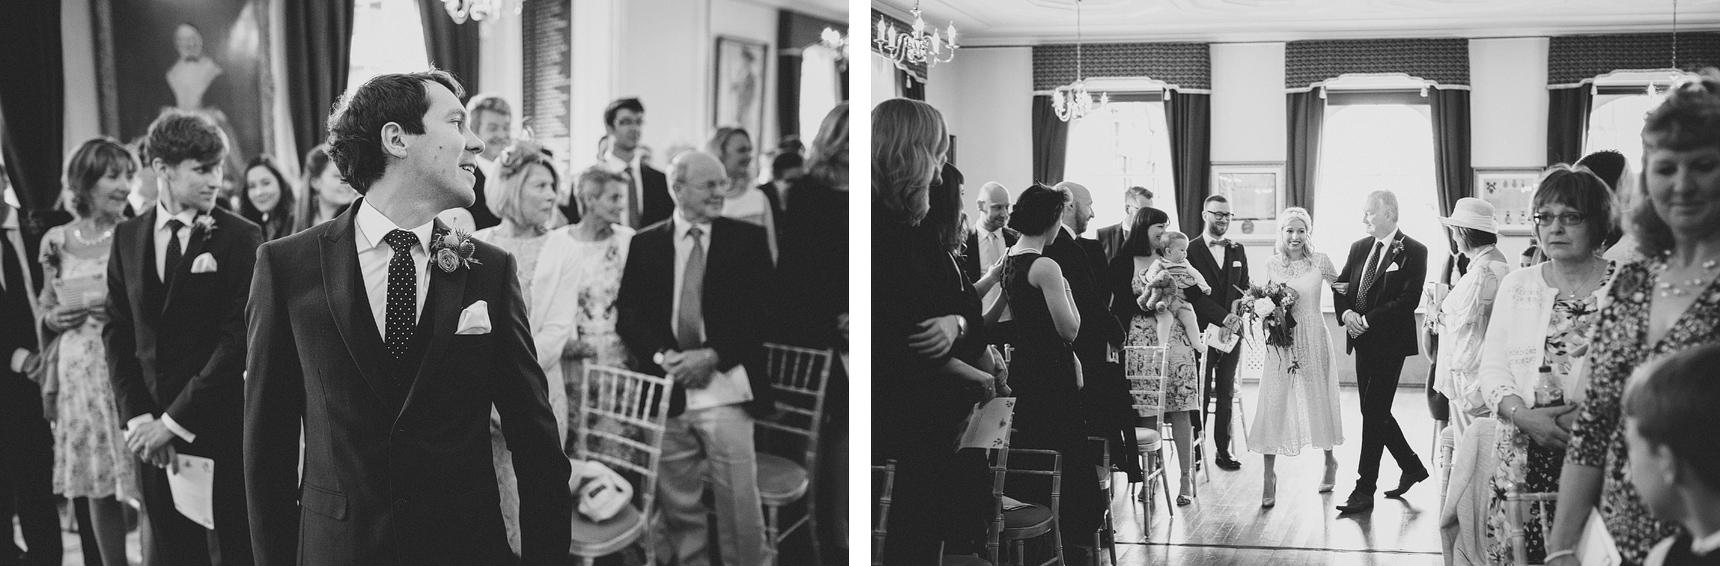 stratford upon avon town hall wedding